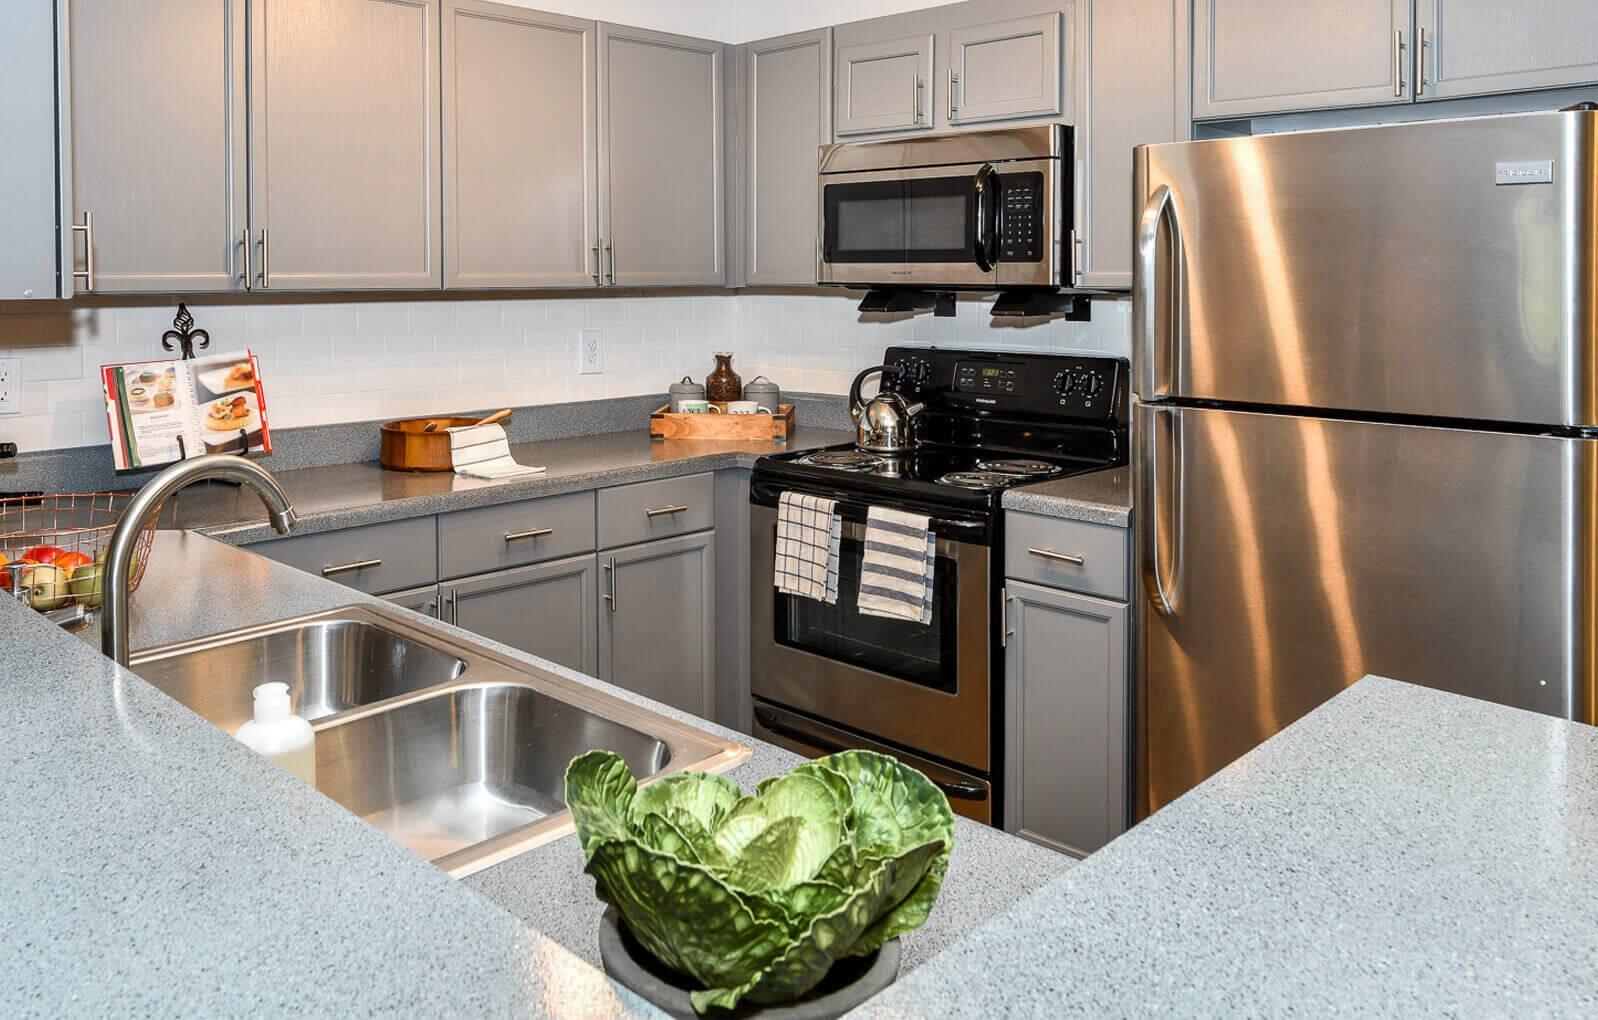 Efficient Appliances In Kitchen, at Crestmark Apartment Homes, Georgia